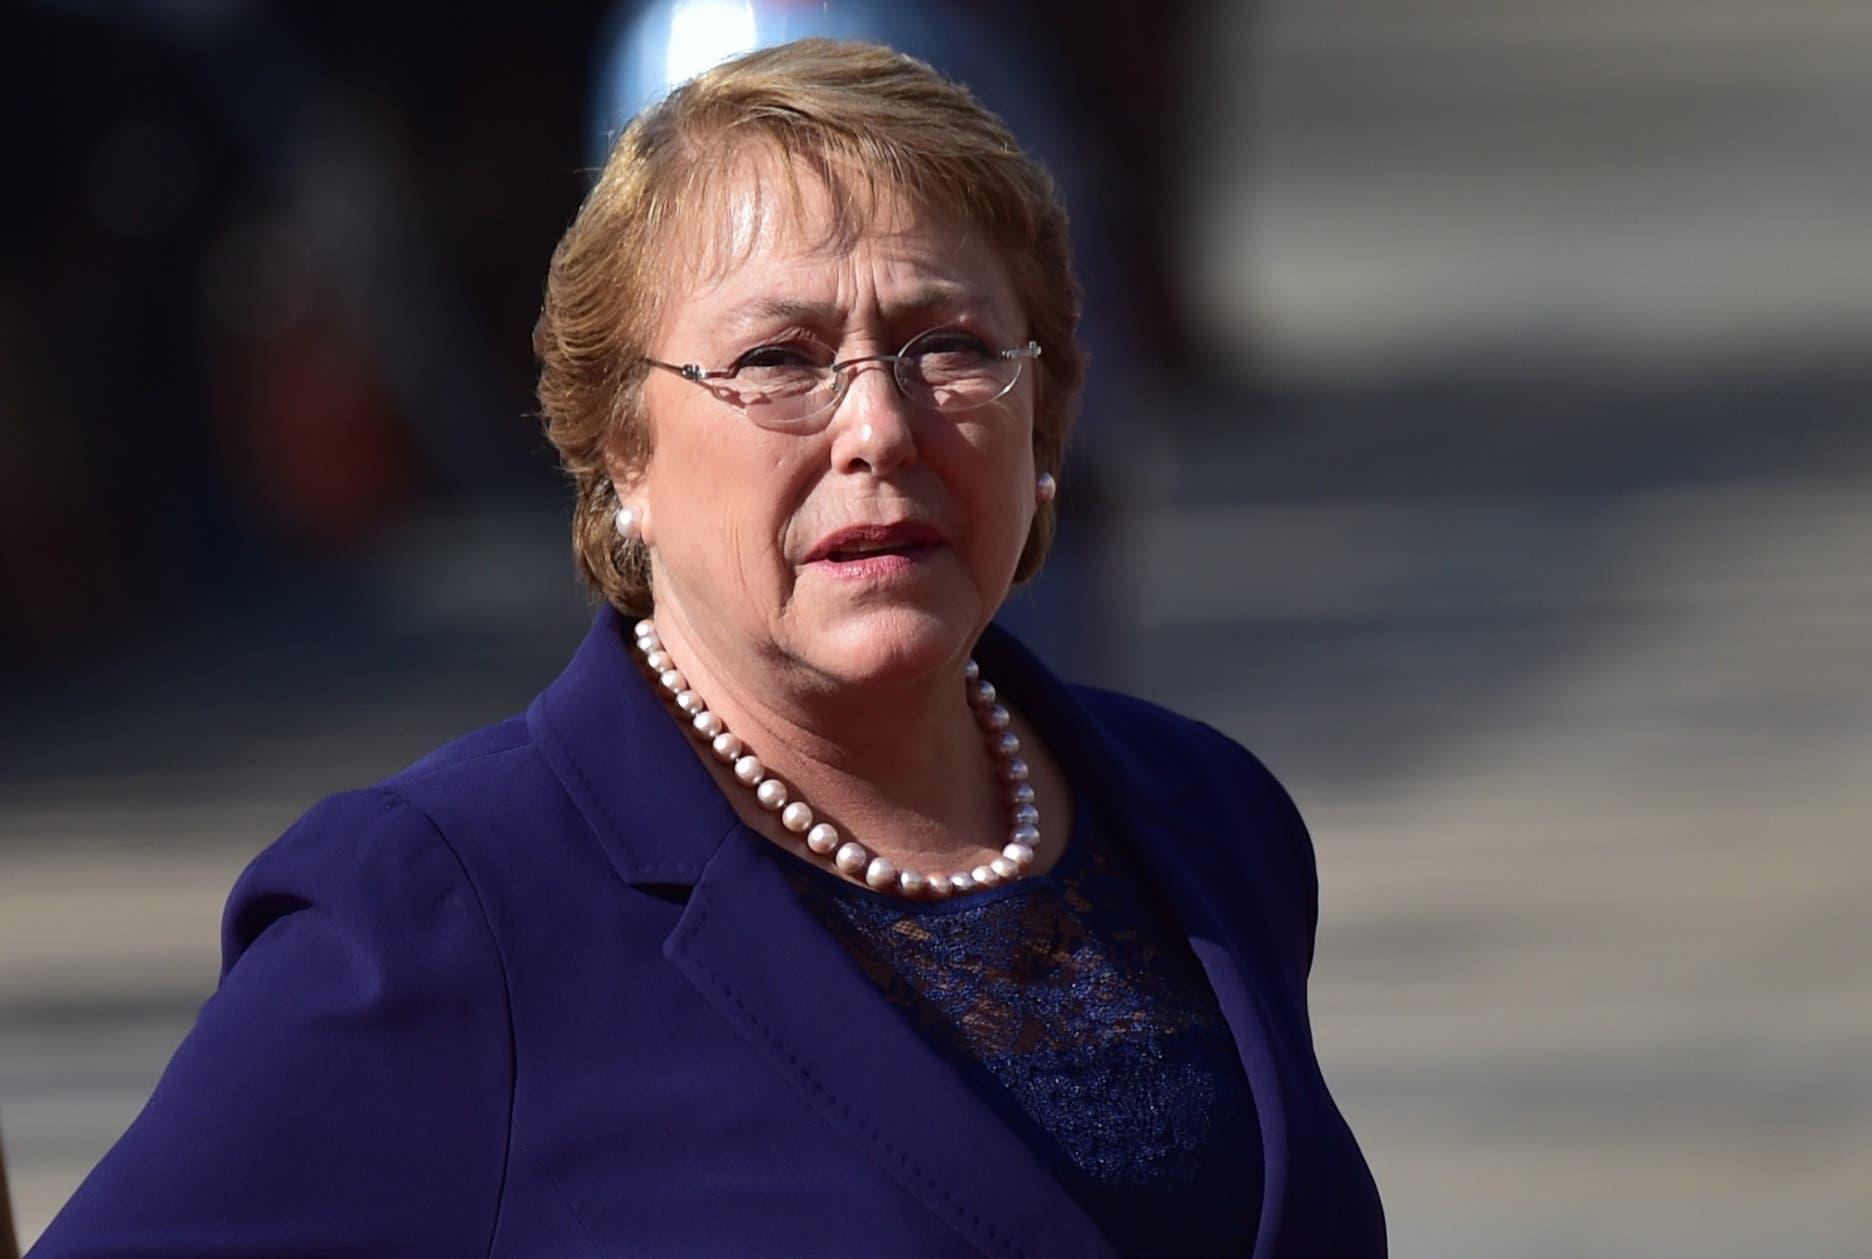 Bachelet viaja a Haití, Ginebra y Portugal con fines políticos y económicos